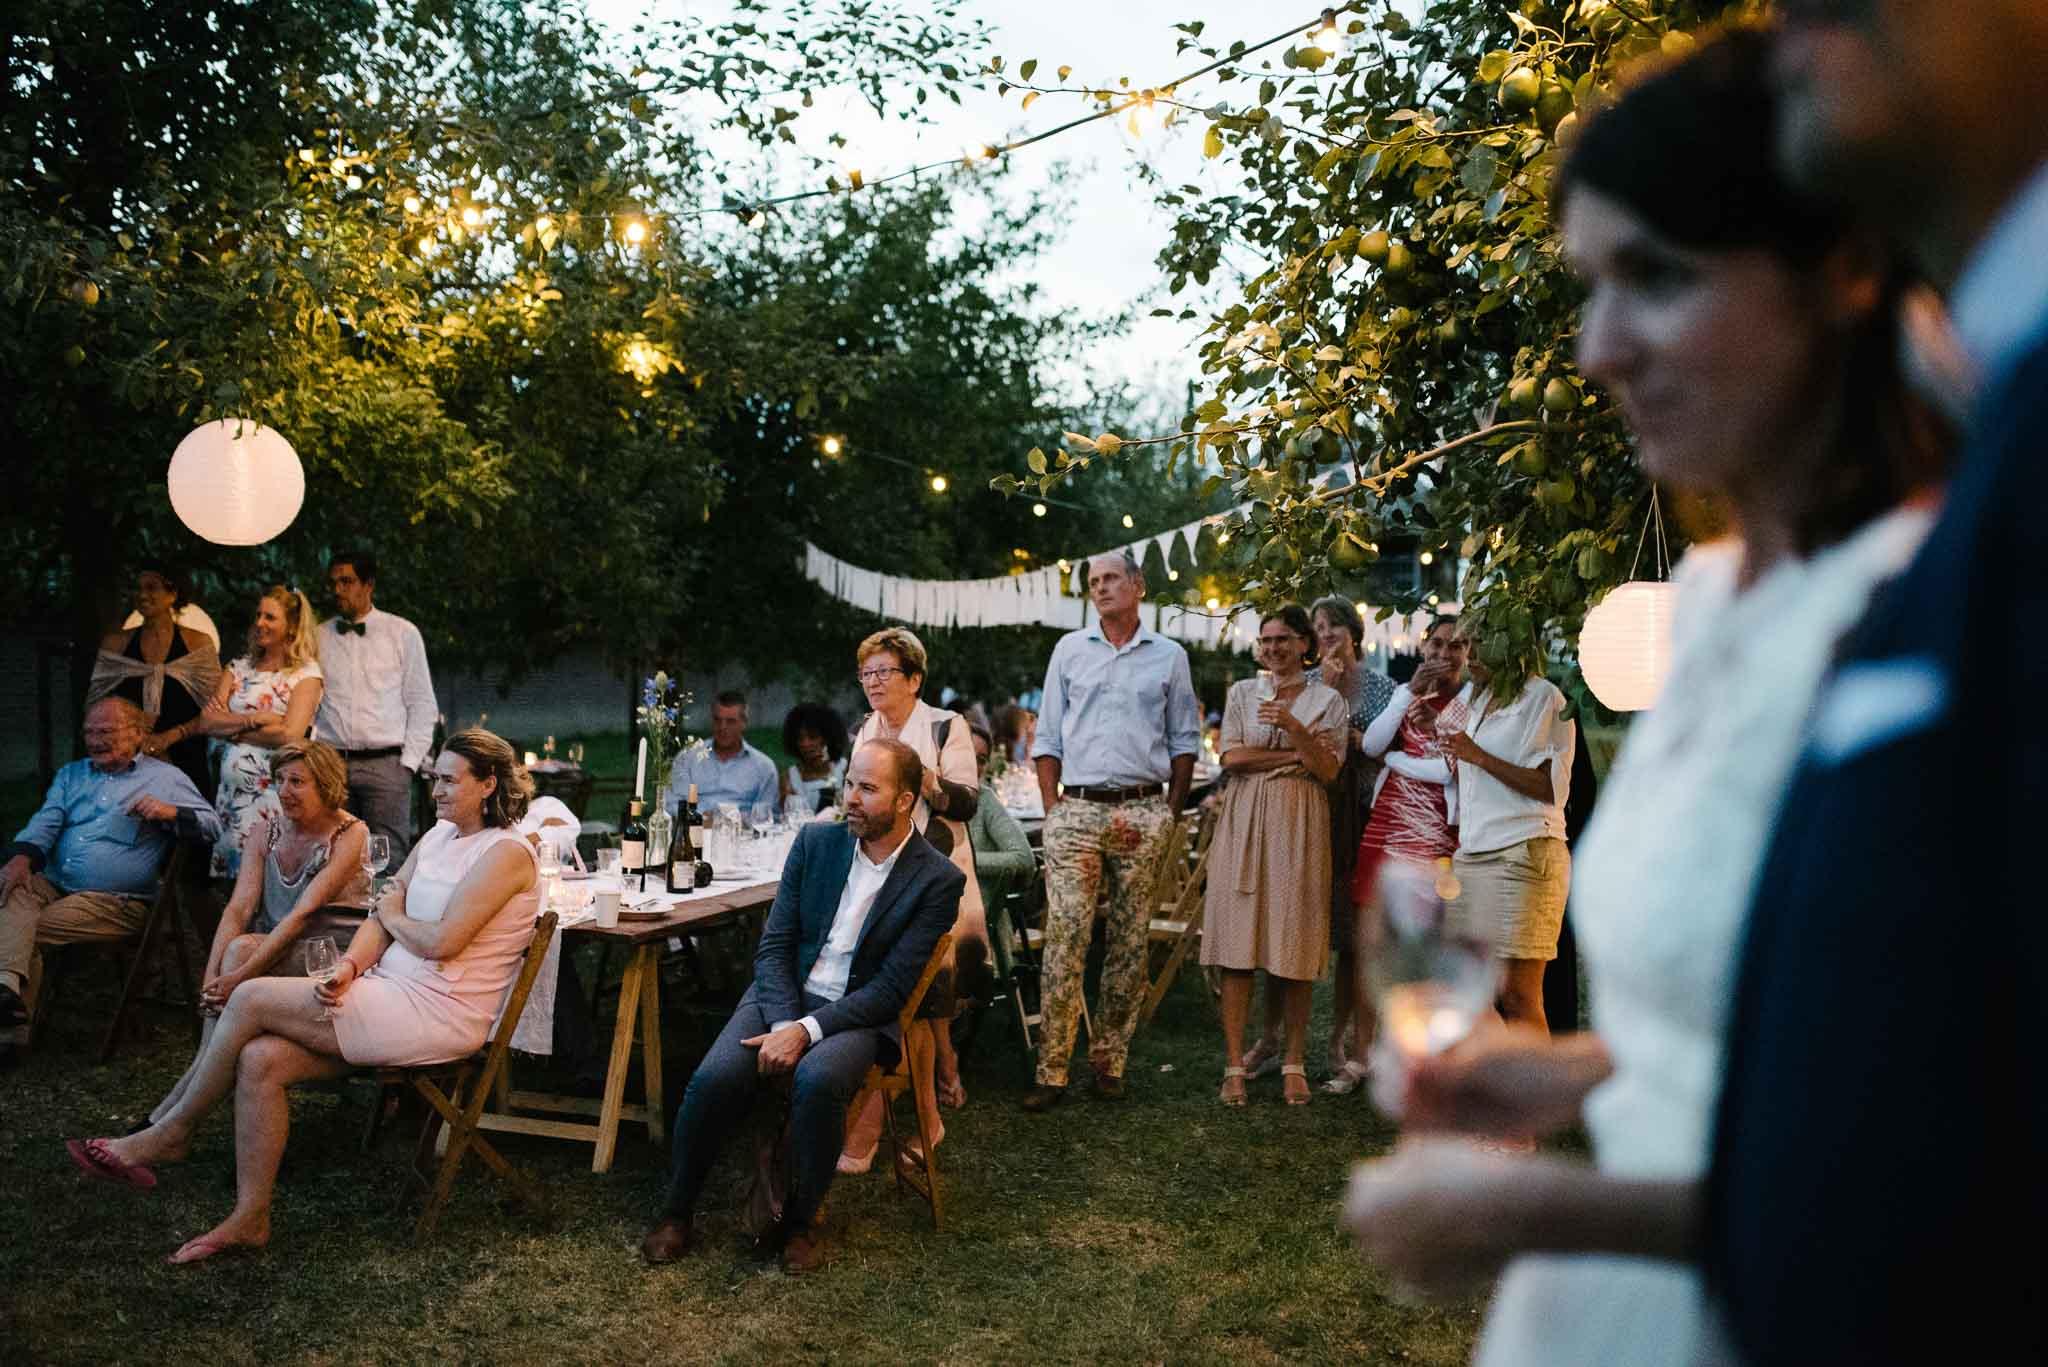 bohemian bruiloft festival stijl weiland ideeen